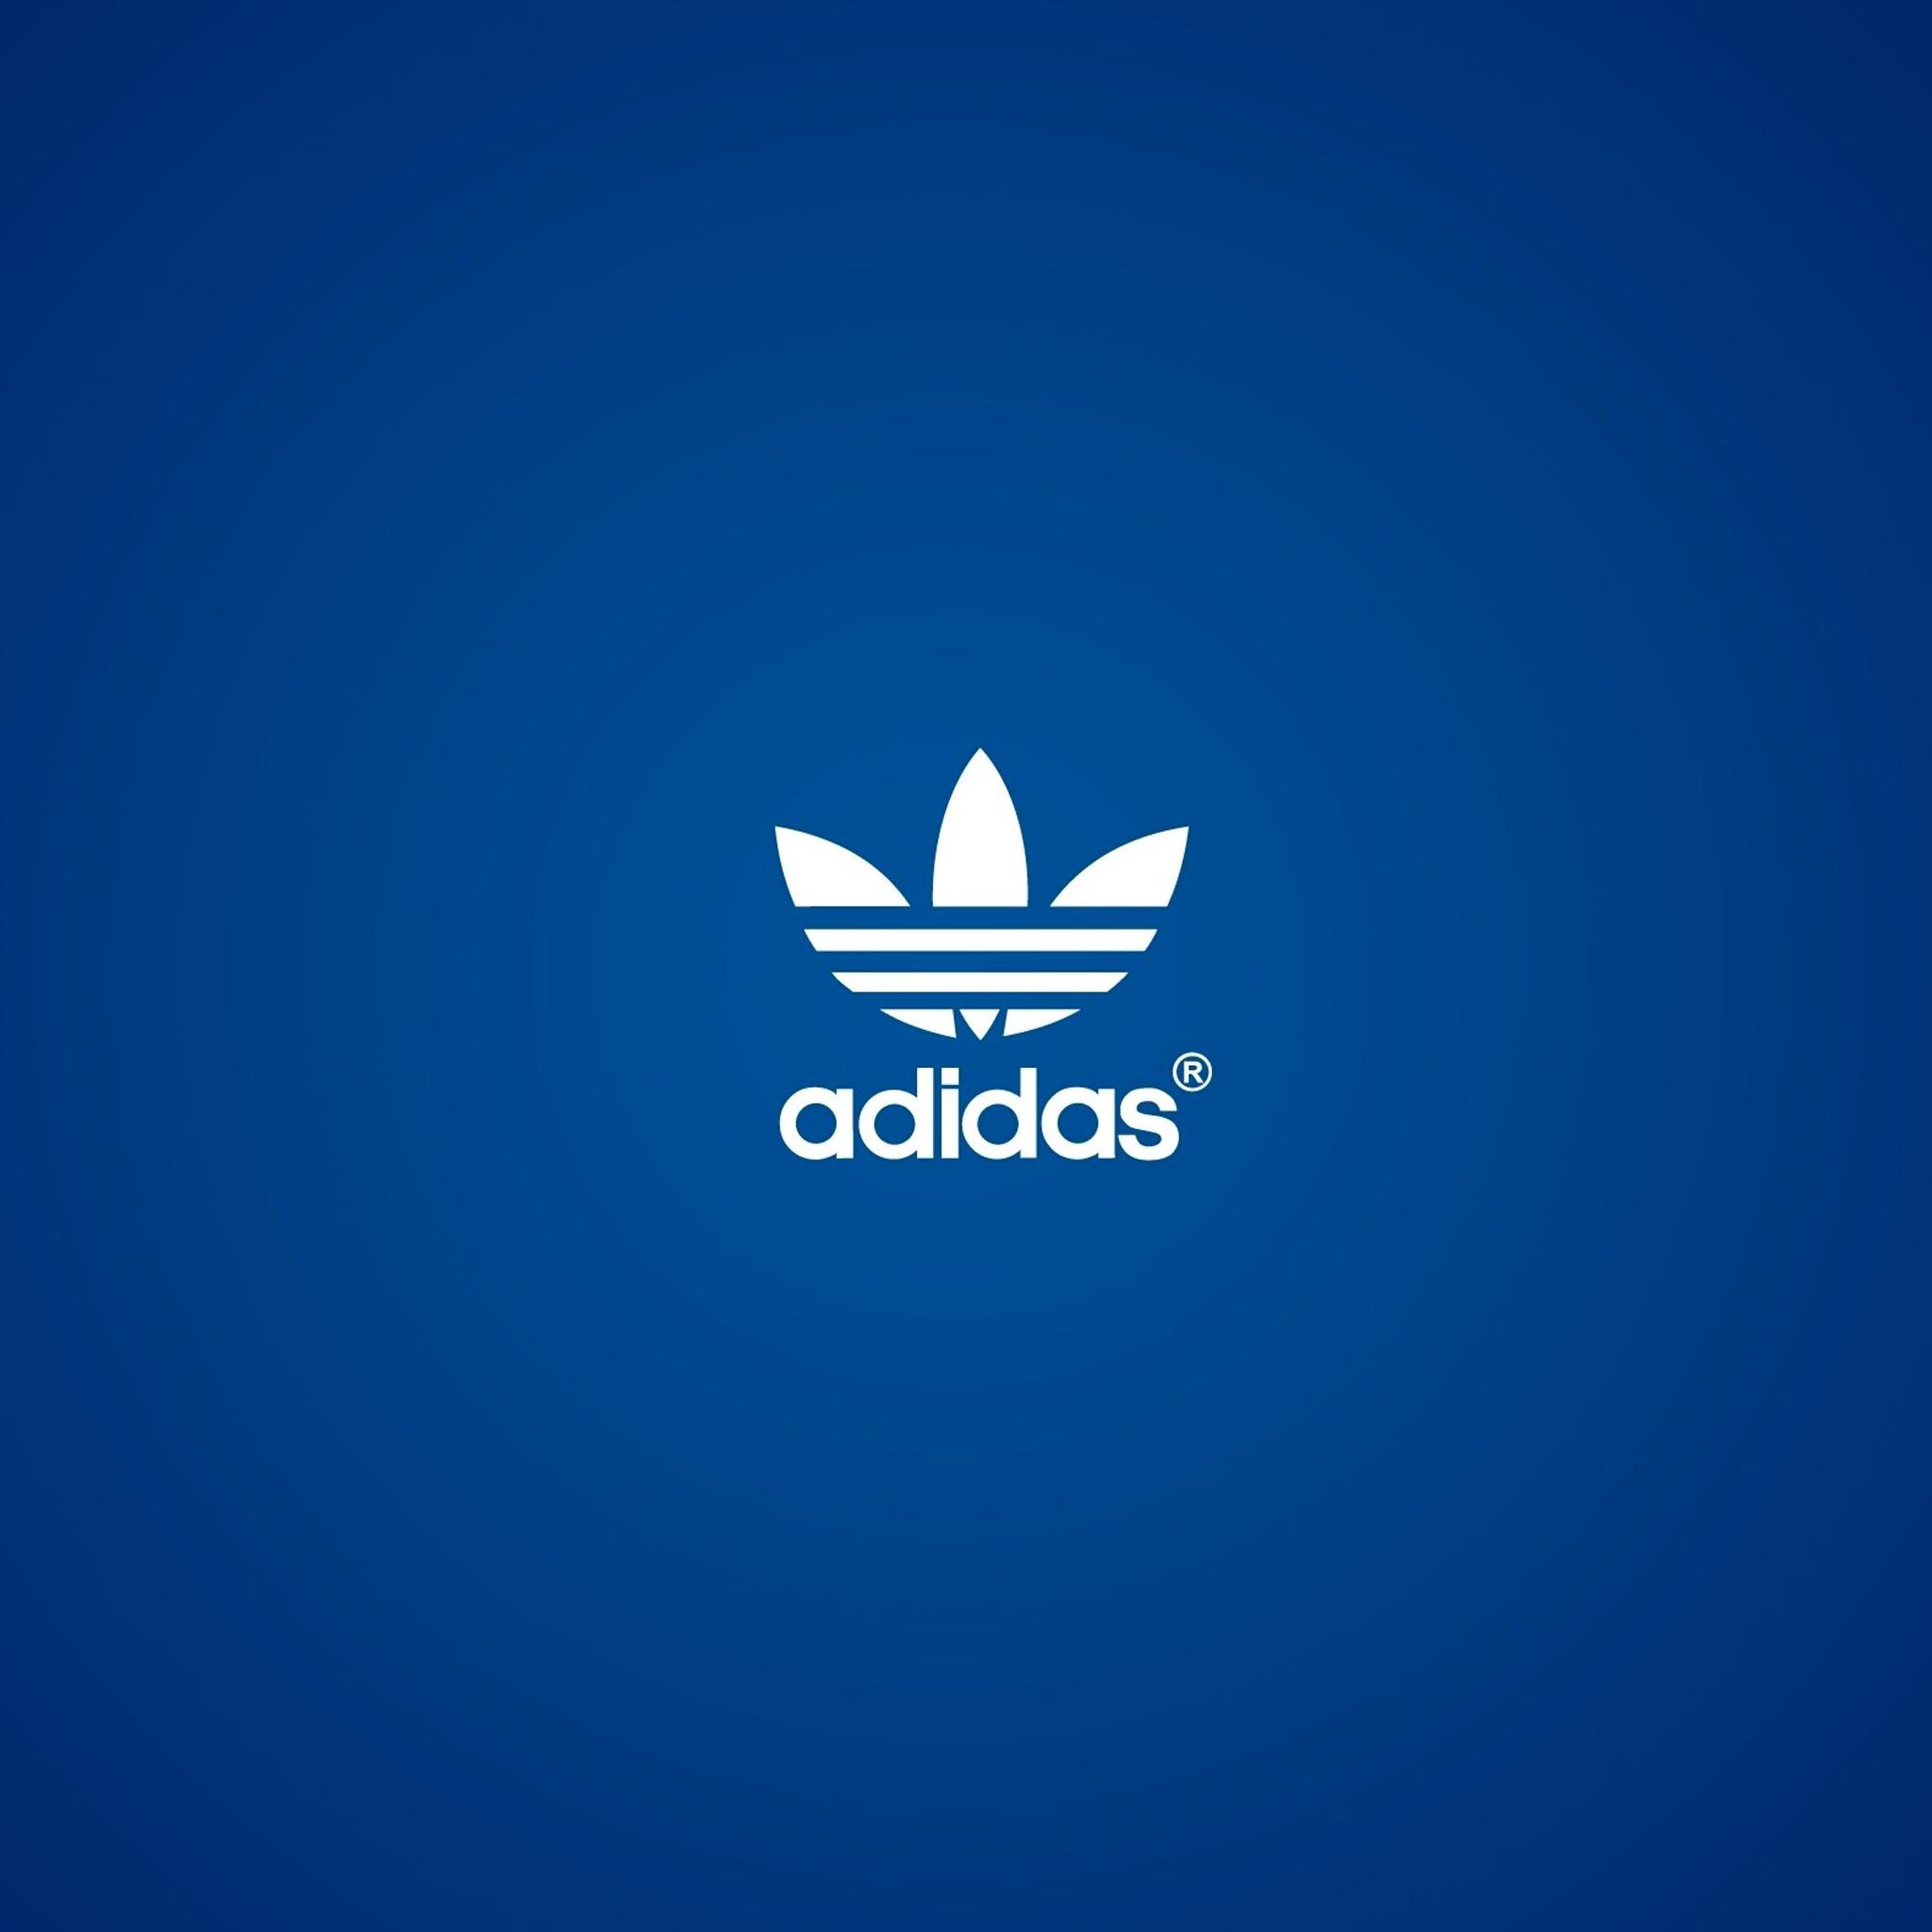 Adidas-Blue-3Wallpapers-iPad-Retina